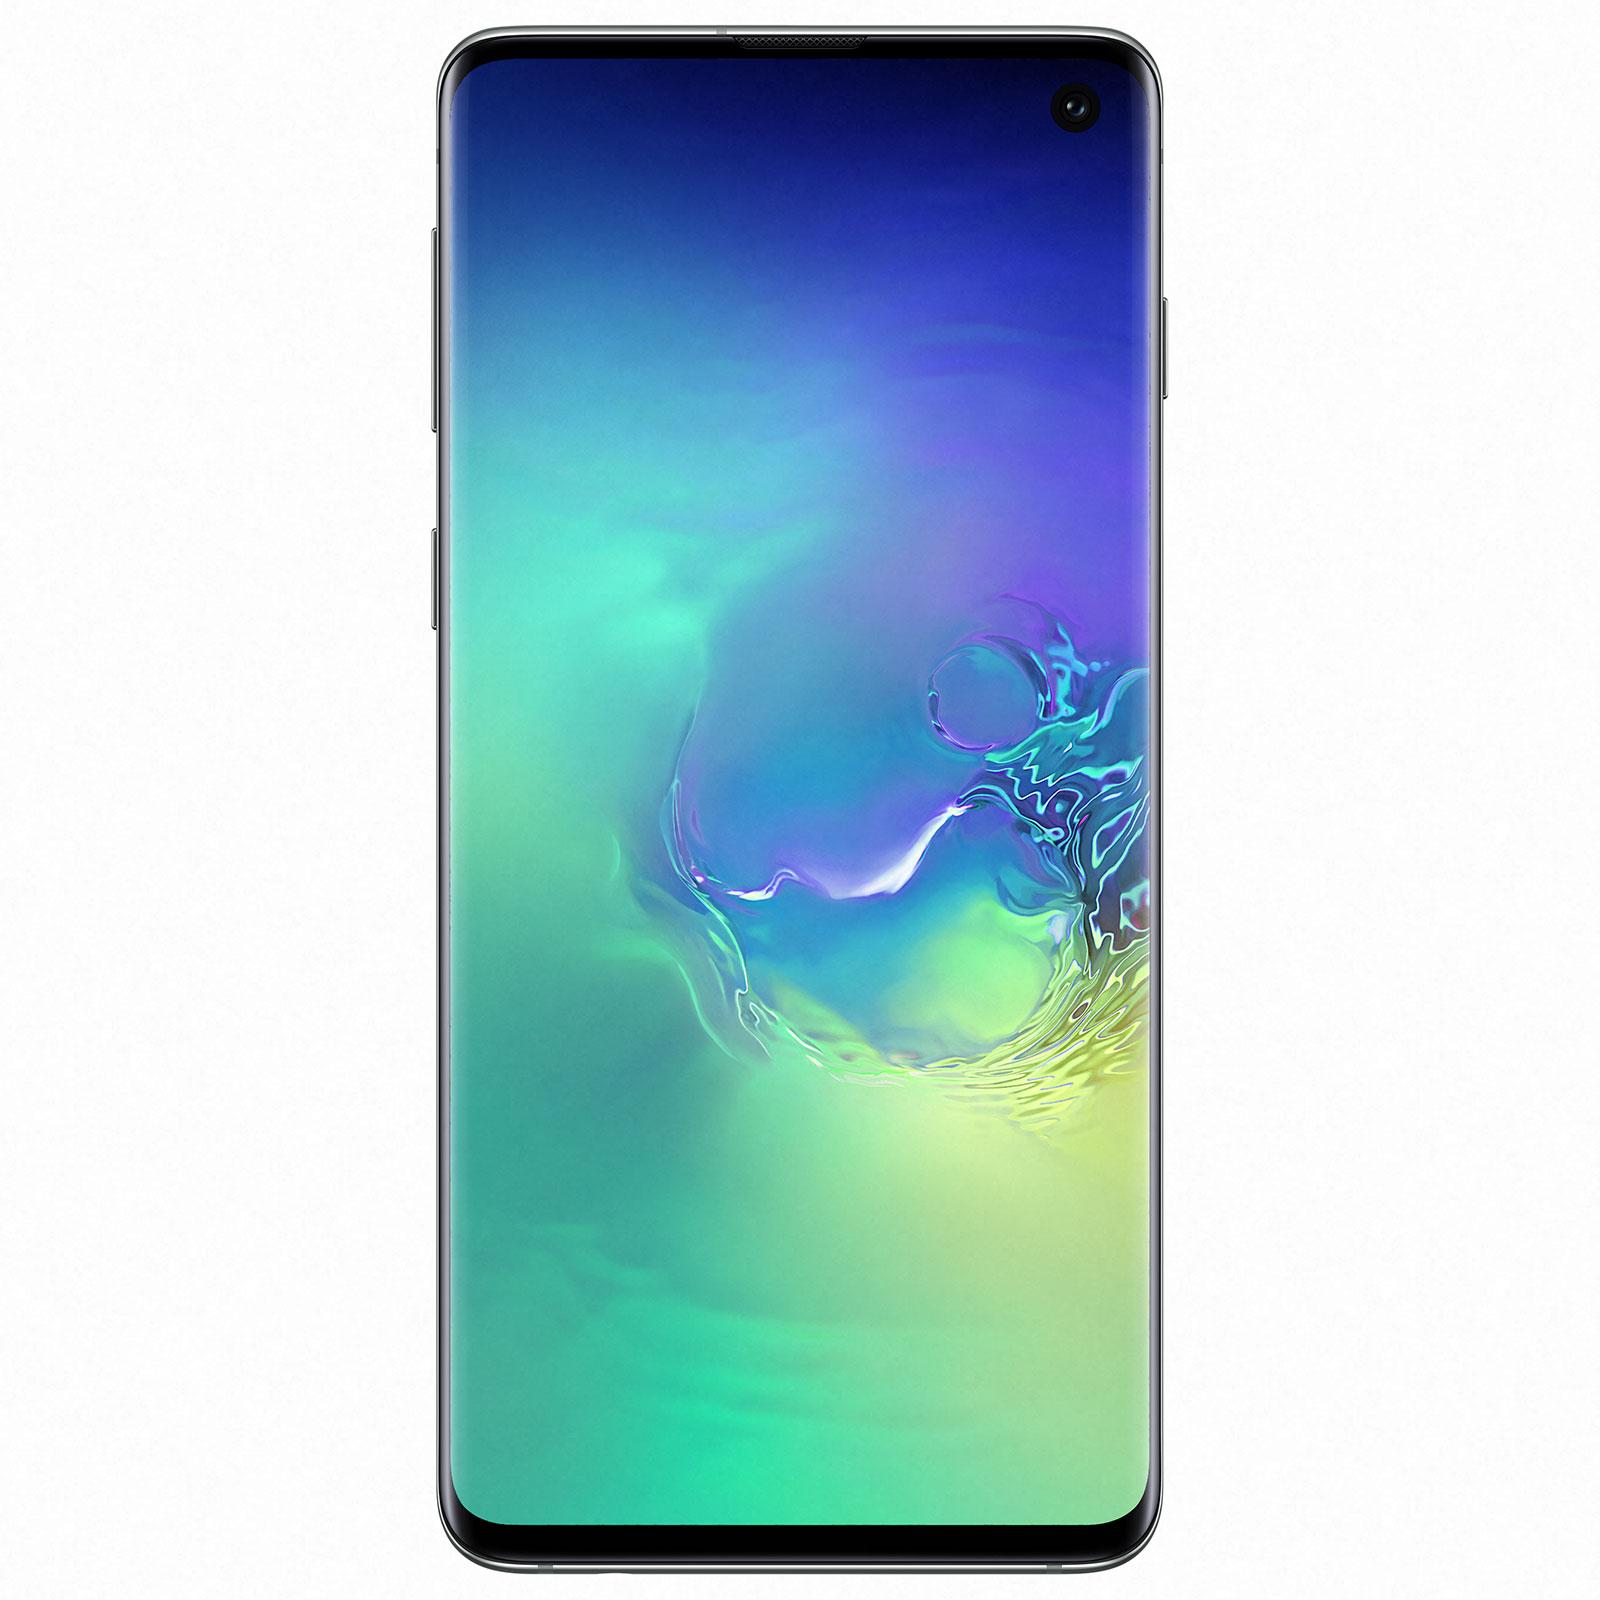 "Mobile & smartphone Samsung Galaxy S10 SM-G973F Vert Prisme (8 Go / 128 Go) Smartphone 4G-LTE Advanced Dual SIM IP68 - Exynos 9820 8-Core 2.8 GHz - RAM 8 Go - Ecran tactile Super AMOLED 6.1"" 1440 x 3040 - 128 Go - NFC/Bluetooth 5.0 - 3400 mAh - Android 9.0"